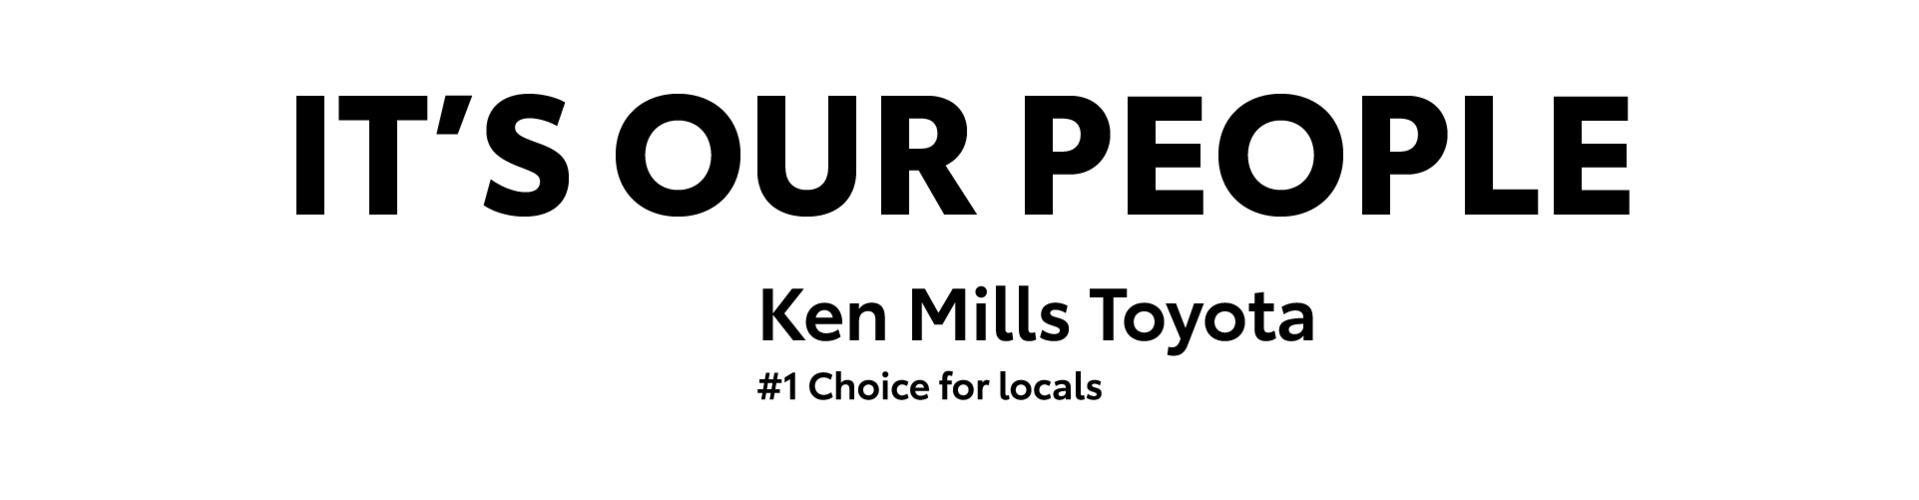 Ken Mills Toyota Career Opportunities Sunshine Coast